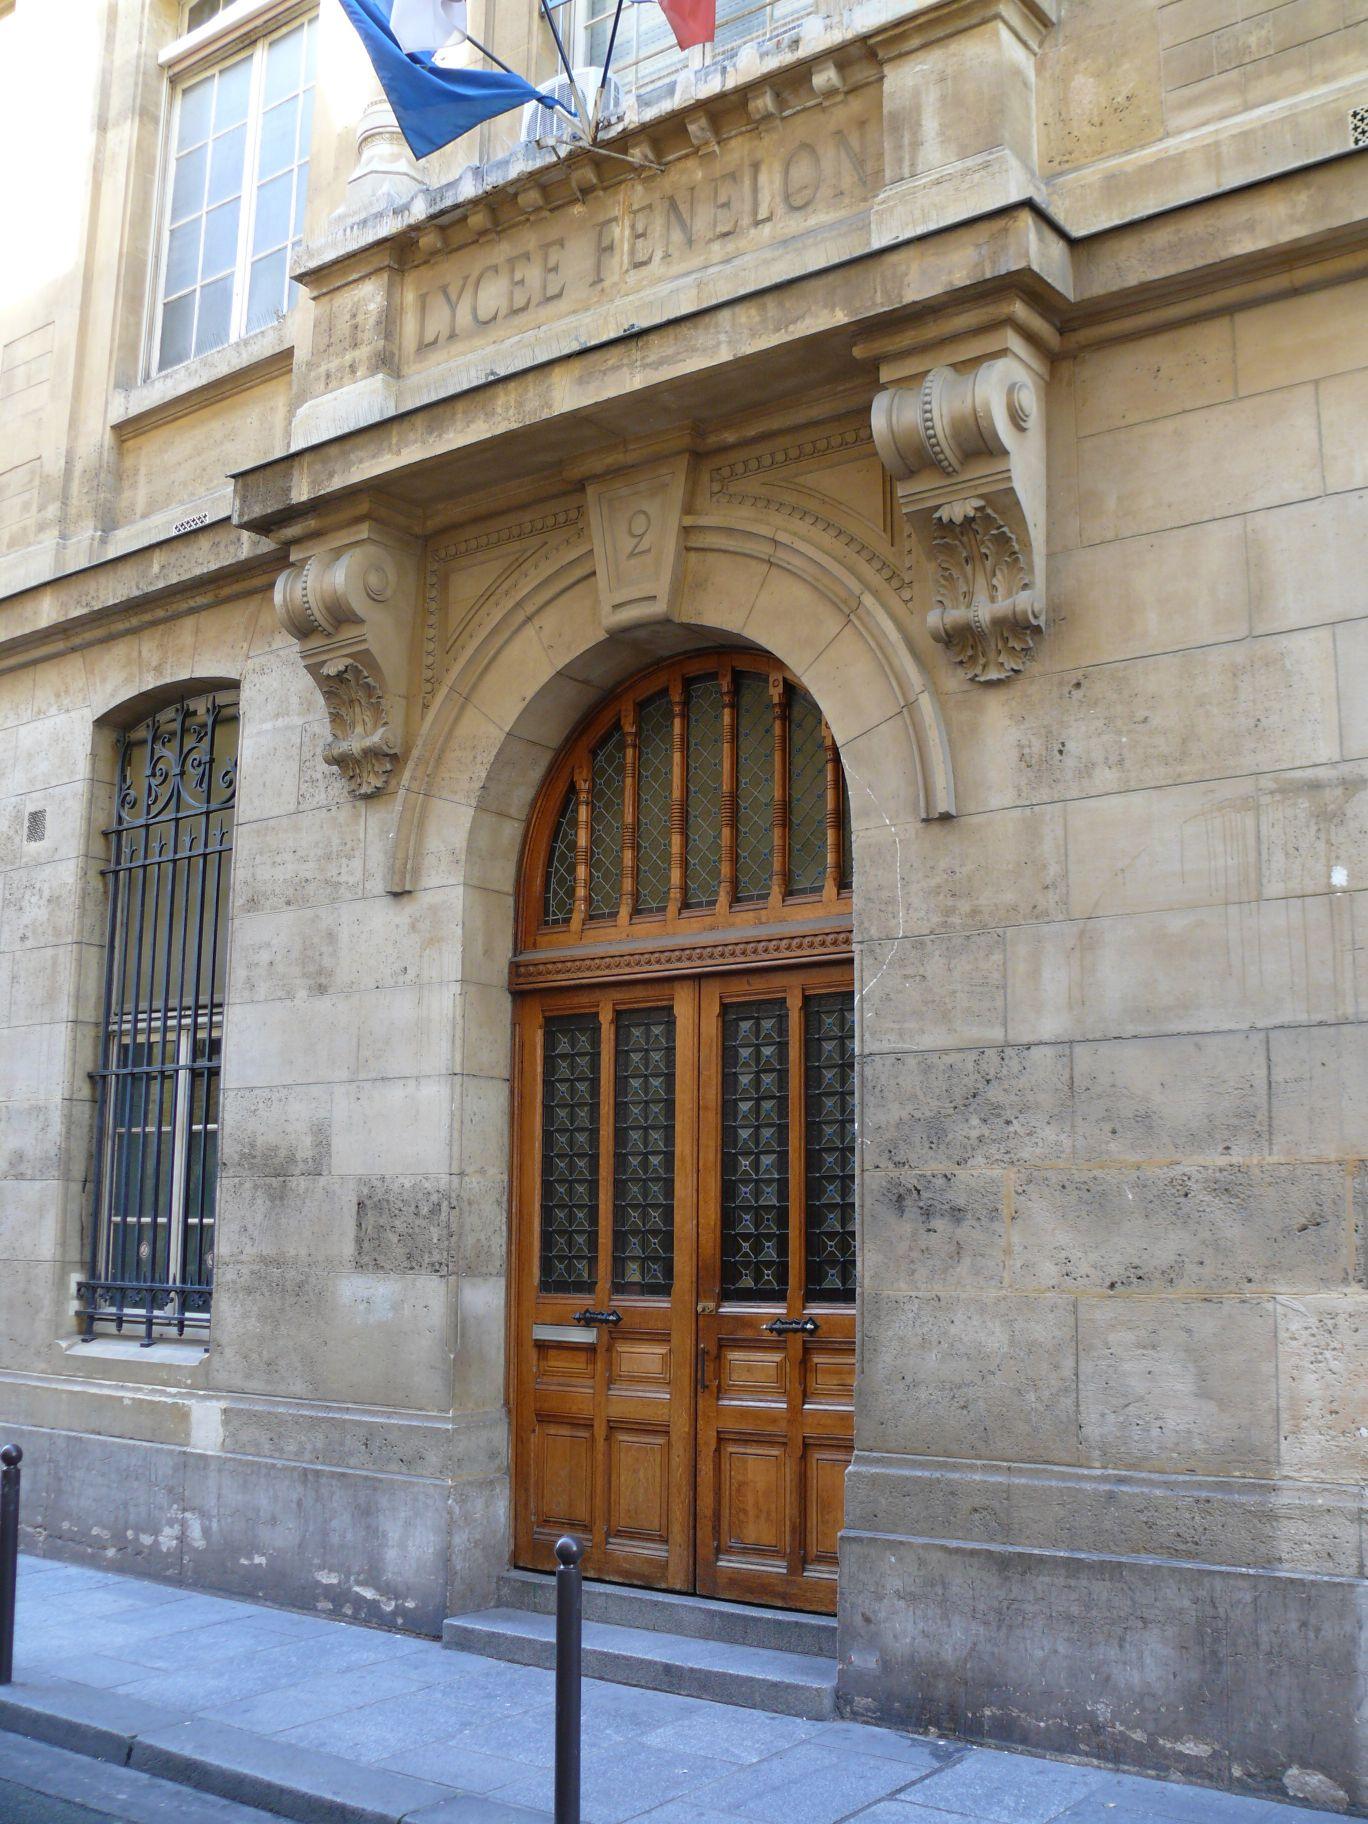 Lyc 233 E F 233 Nelon Paris Wikip 233 Dia